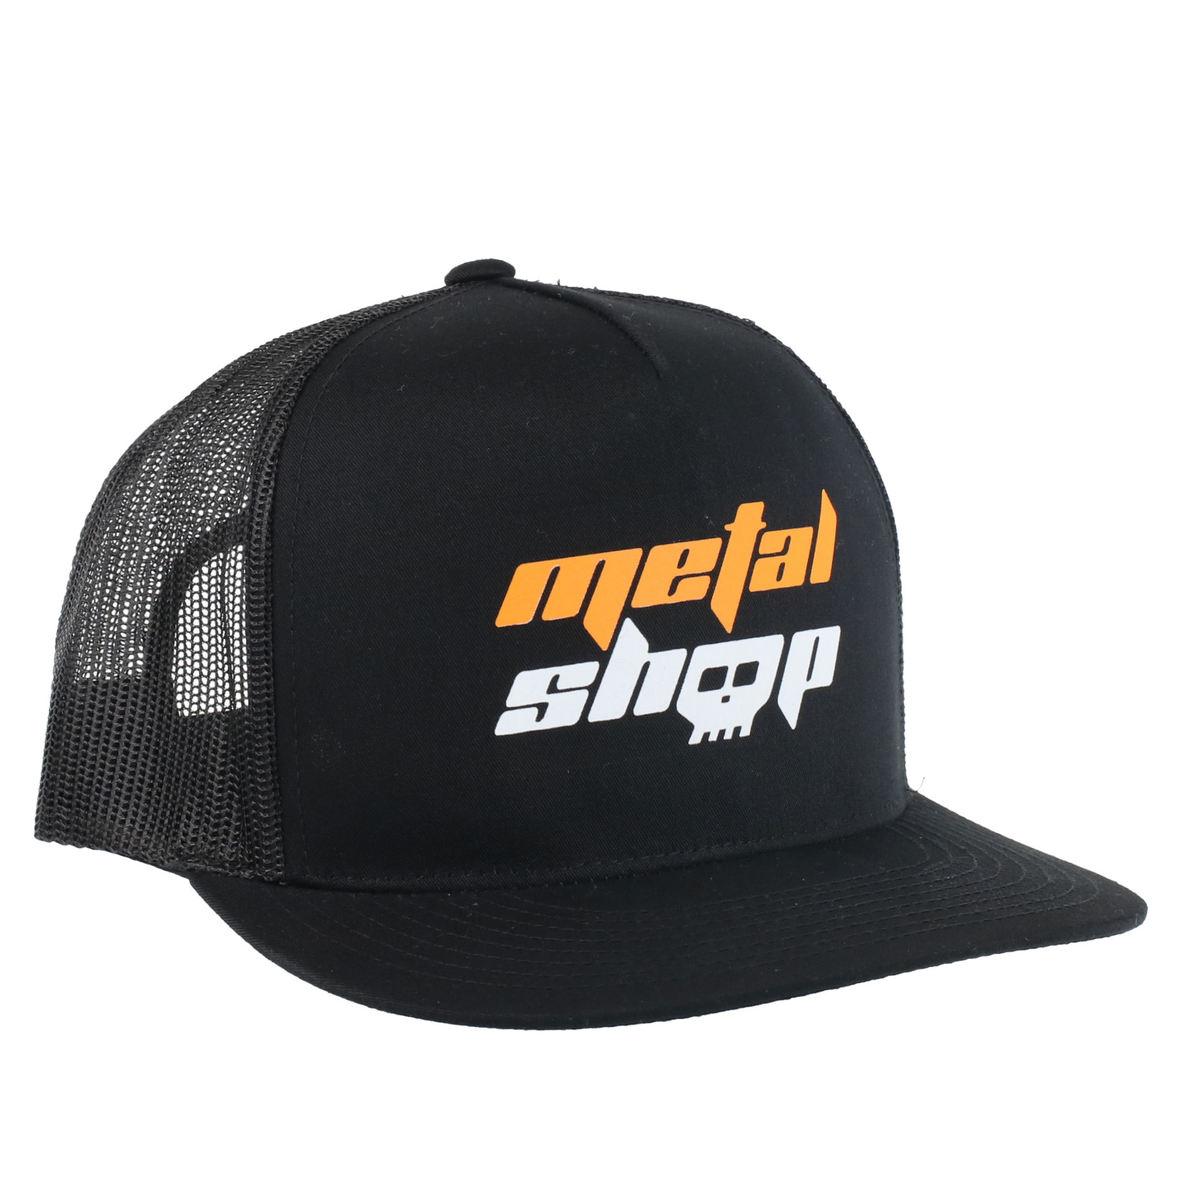 šiltovka METALSHOP - FX6006